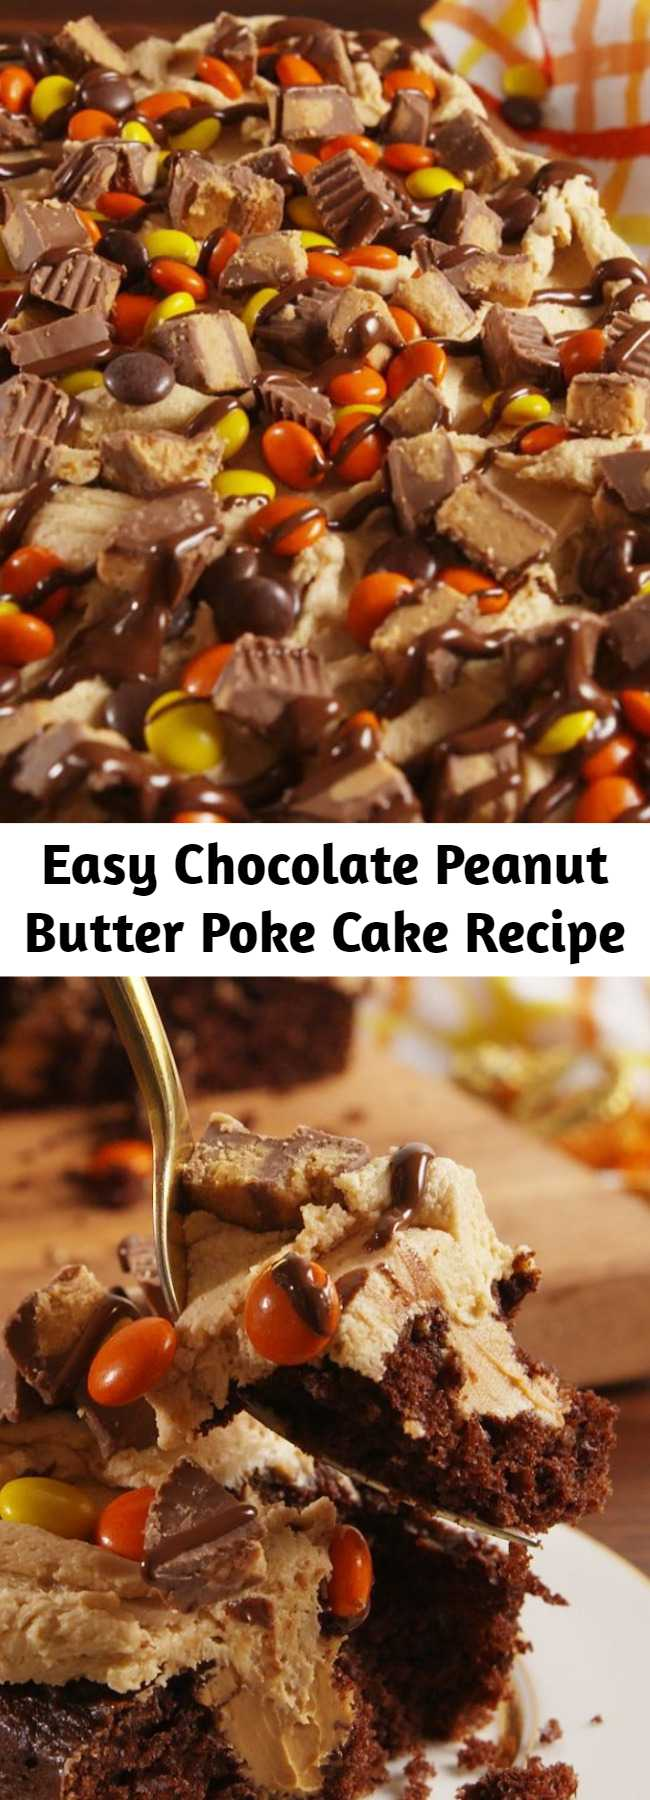 Easy Chocolate Peanut Butter Poke Cake Recipe - Chocolate peanut butter poke cake is for serious butter lovers only. #easy #recipe #chocolate #peanutbutter #pb #pokecake #cake #dessert #reeses #reesespieces #baking